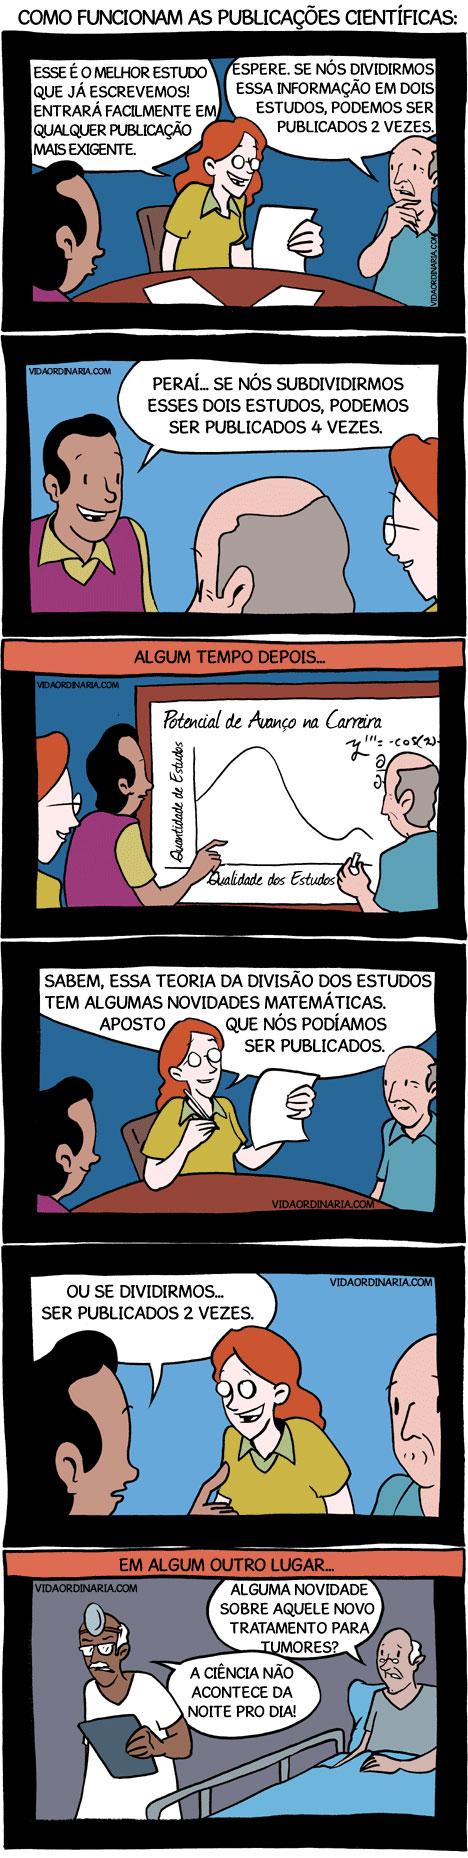 http://vidaordinaria.files.wordpress.com/2009/09/publicacoes-cientificas.jpg